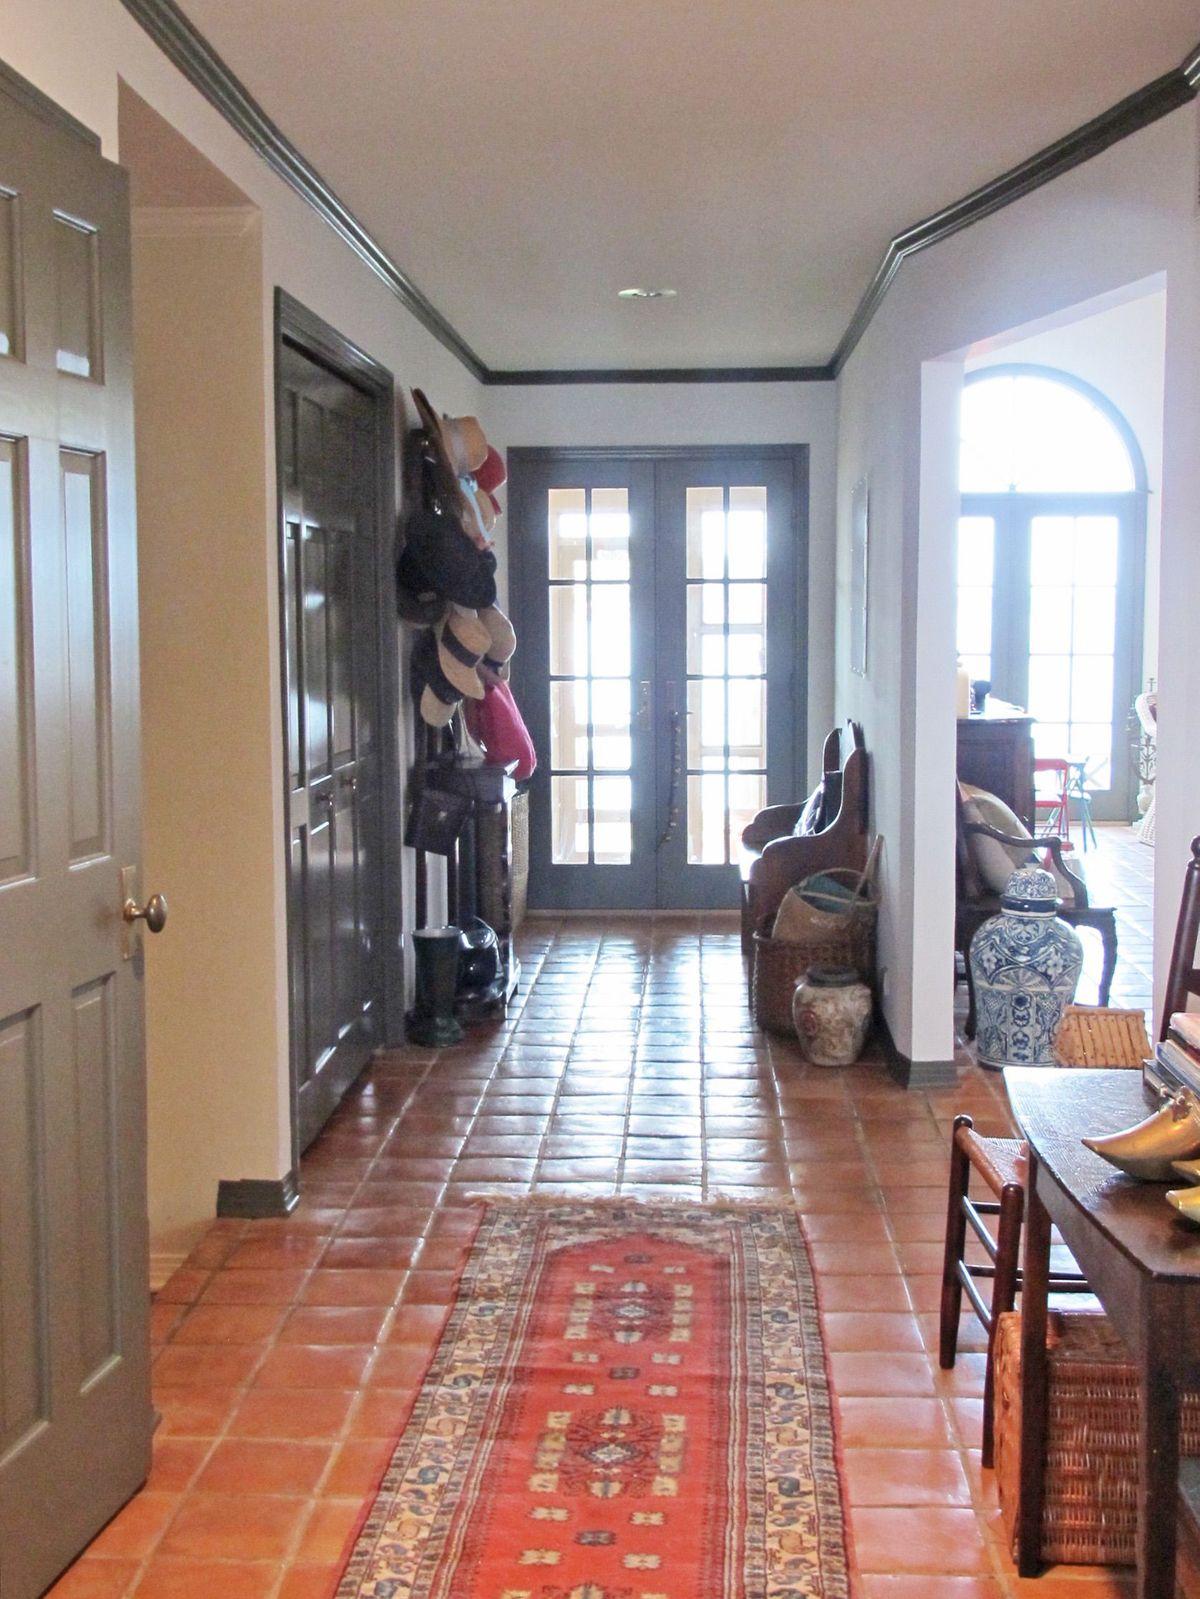 Montana Lakehouse Video Shoot Location Homes Dallas 13.jpg